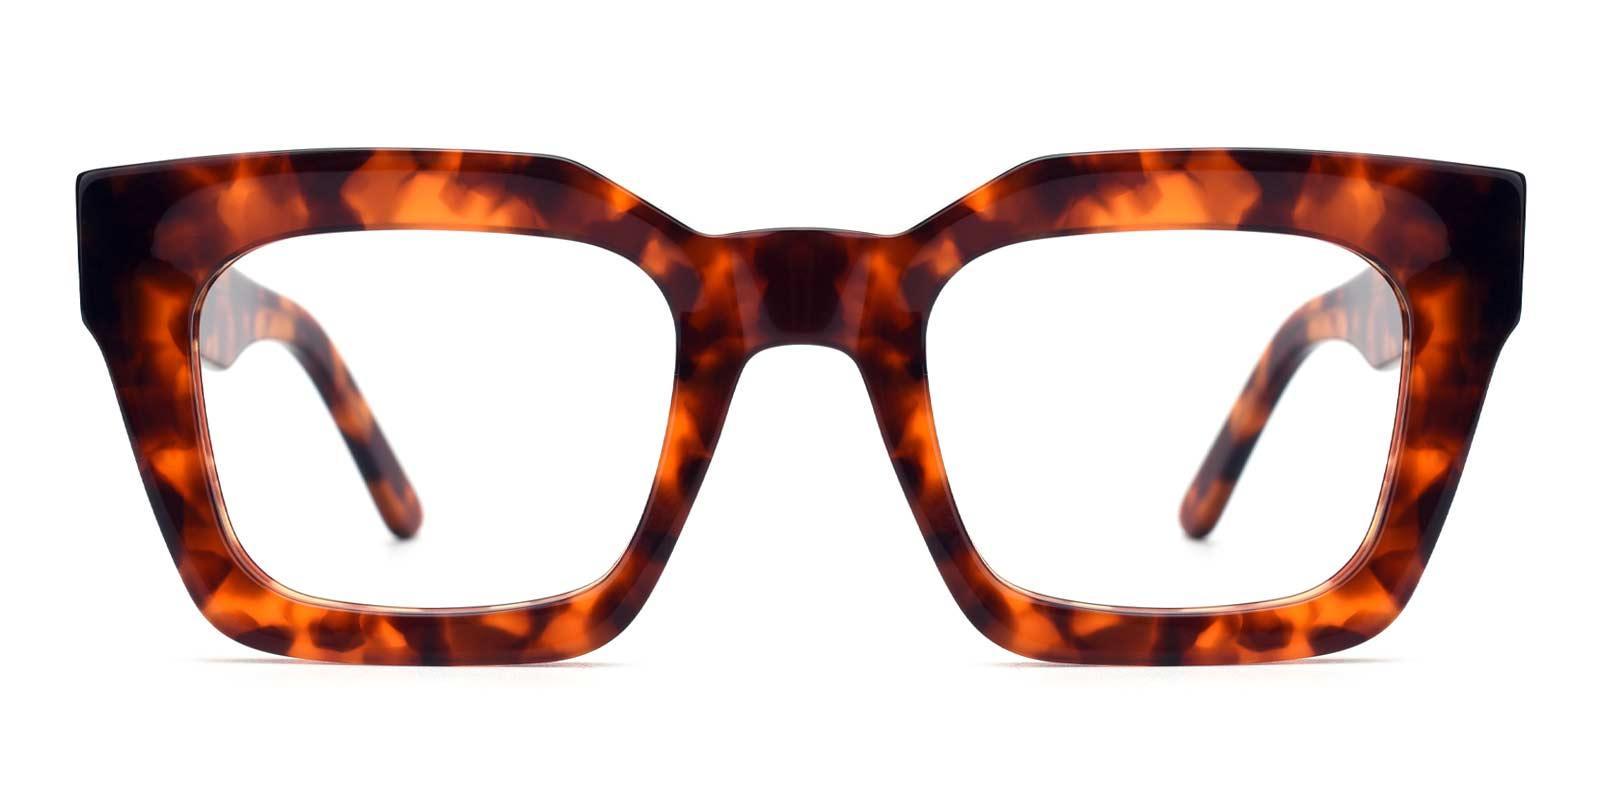 Esther-Tortoise-Geometric-Acetate-Eyeglasses-additional2